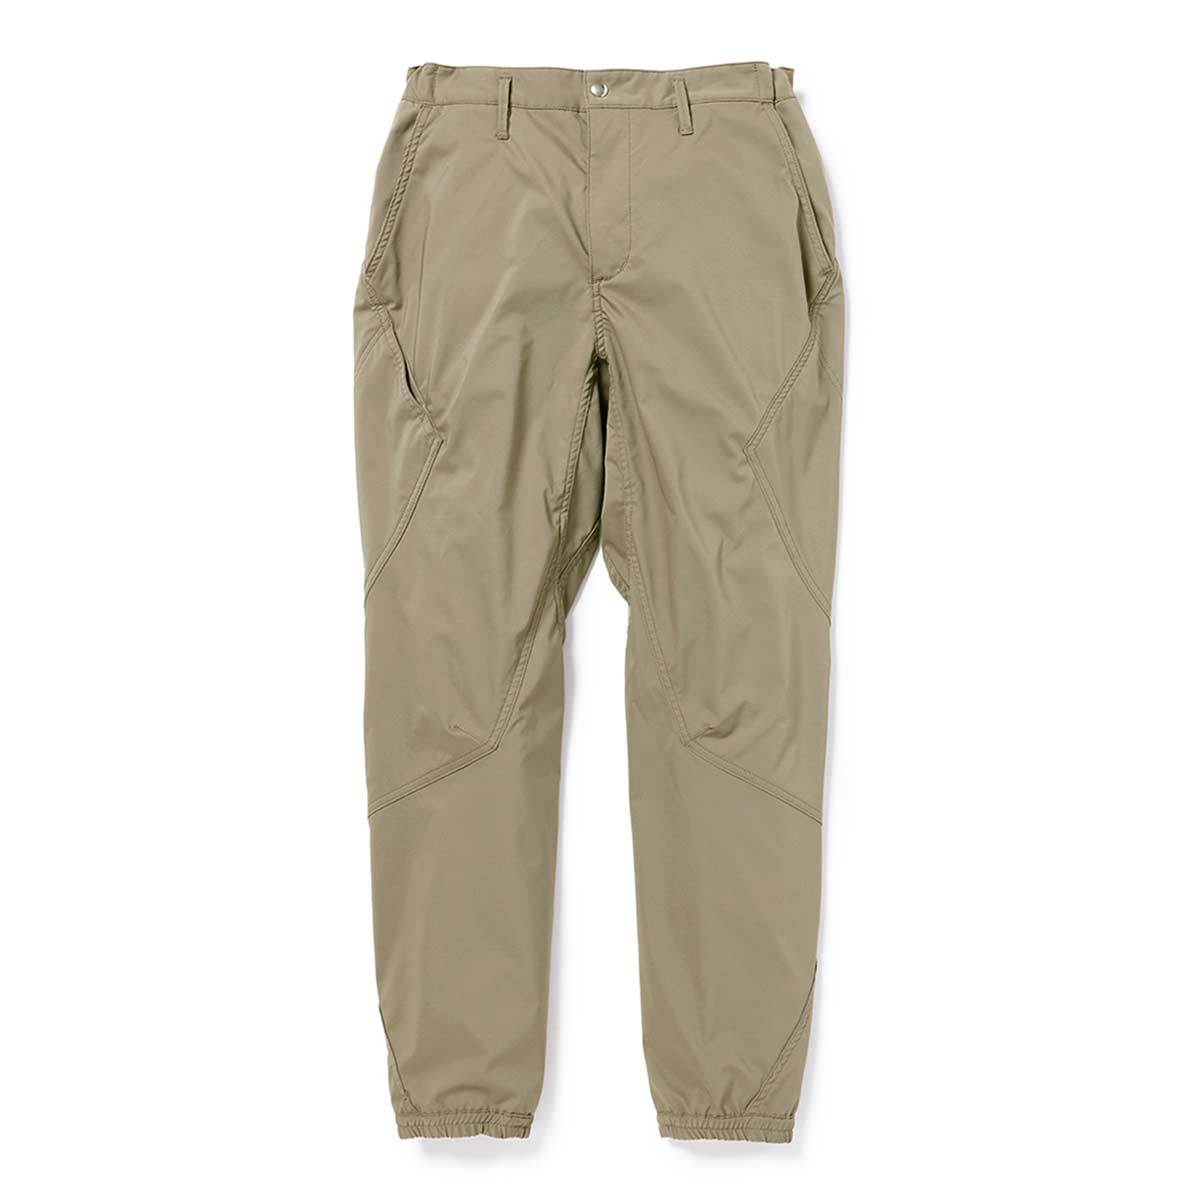 nonnative / CYCLIST EASY RIB PANTS TAPERED FIT POLY TWILL Pliantex -BEIGE